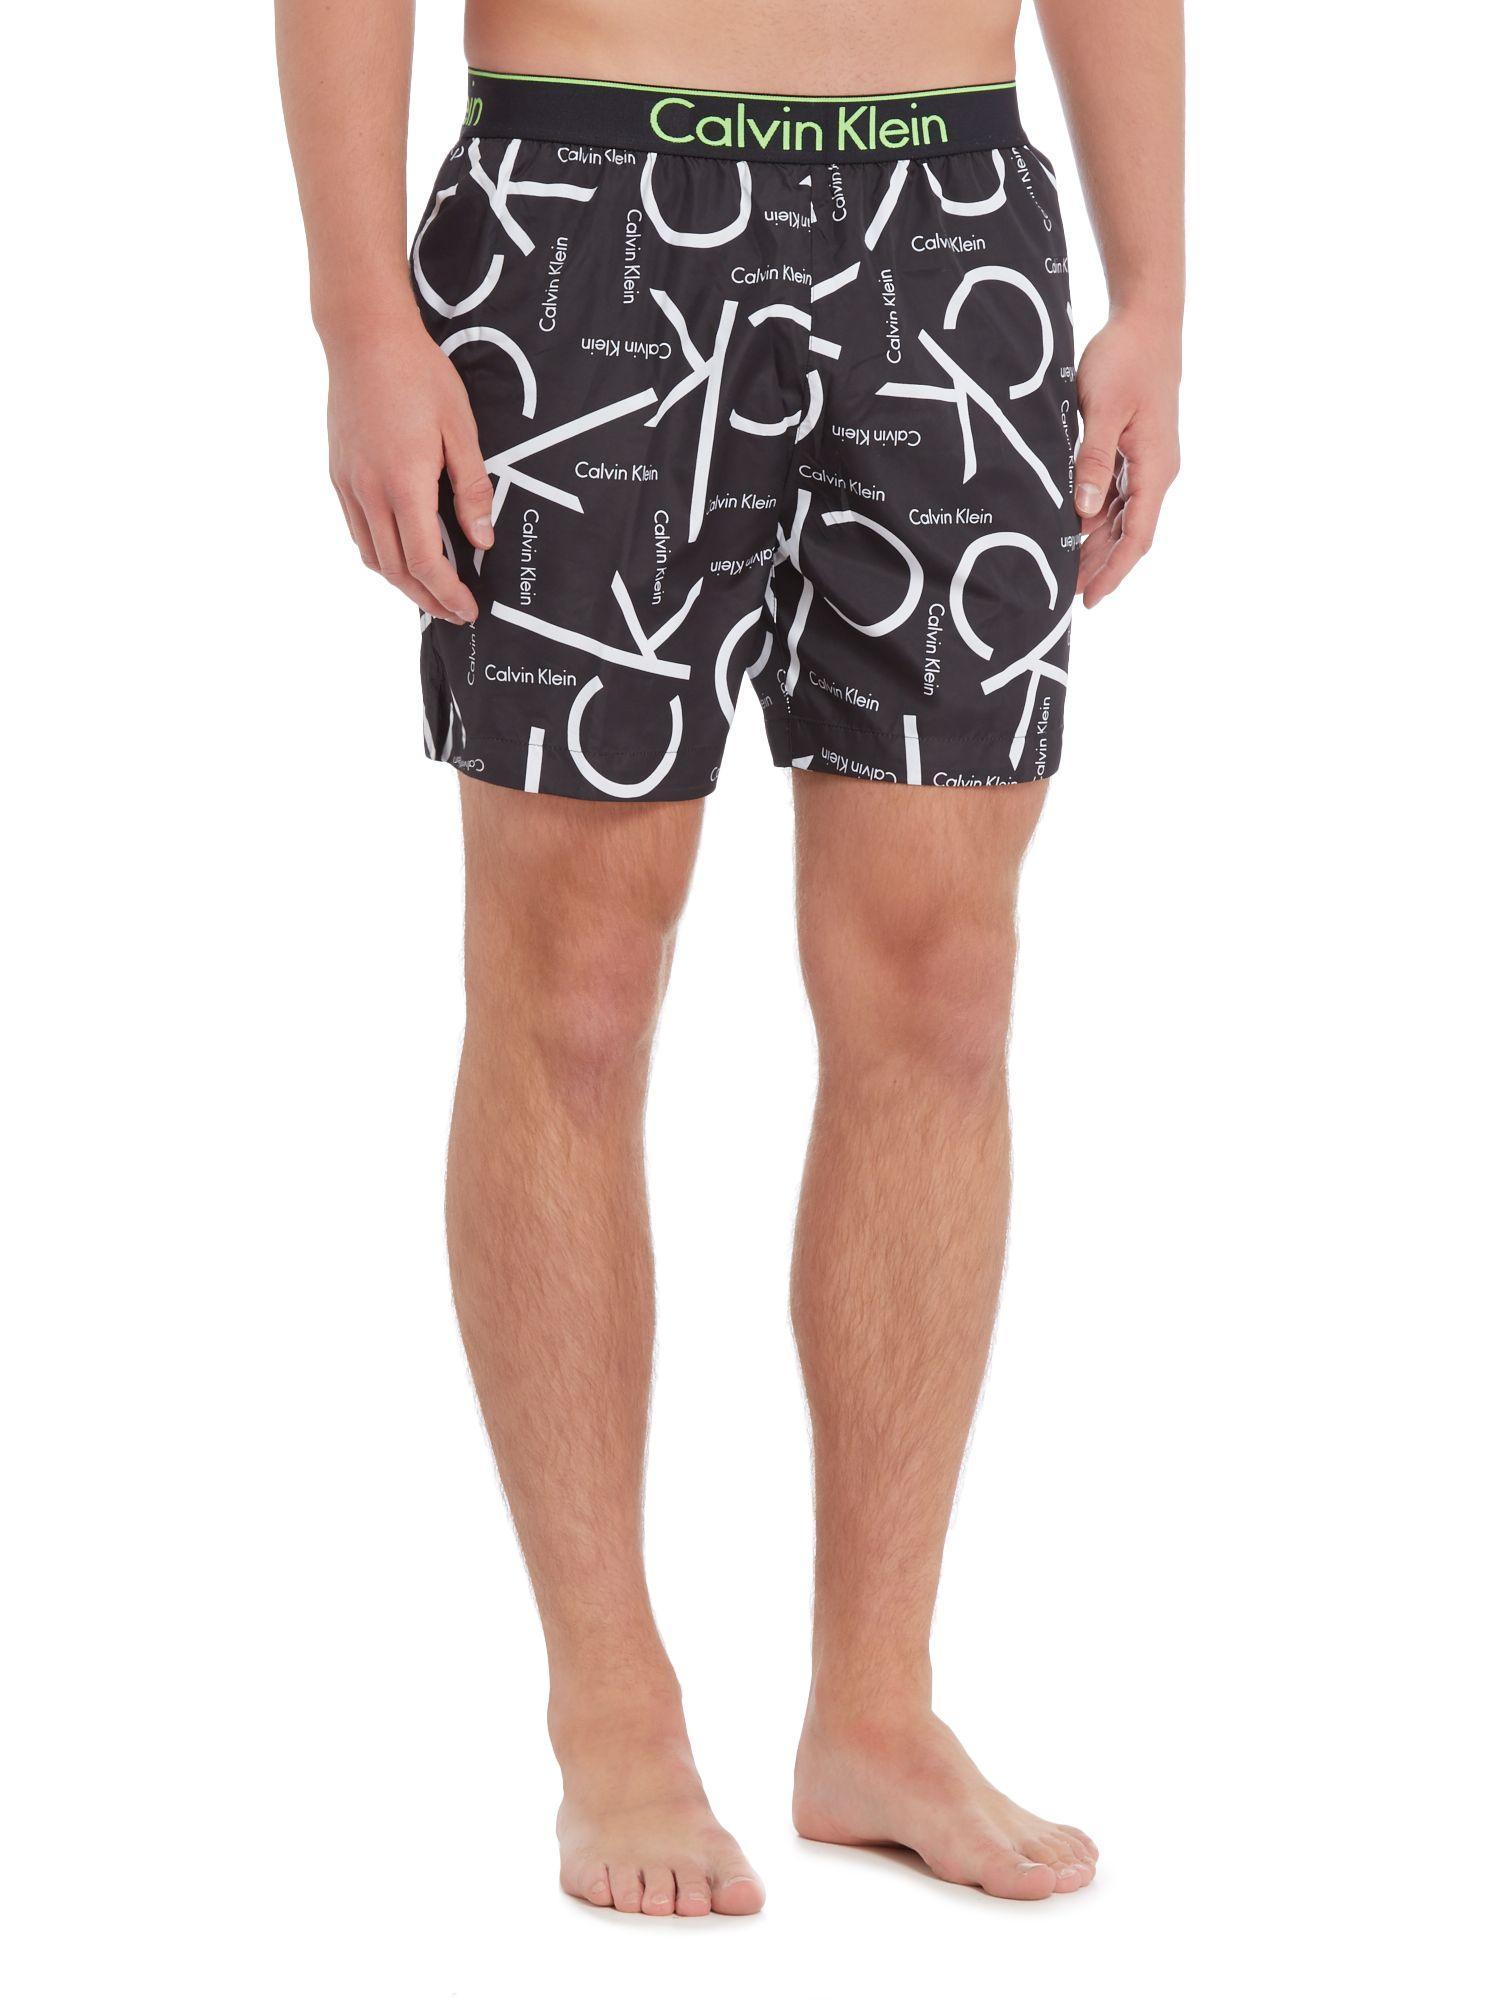 lyst calvin klein ck print swim shorts in black for men. Black Bedroom Furniture Sets. Home Design Ideas